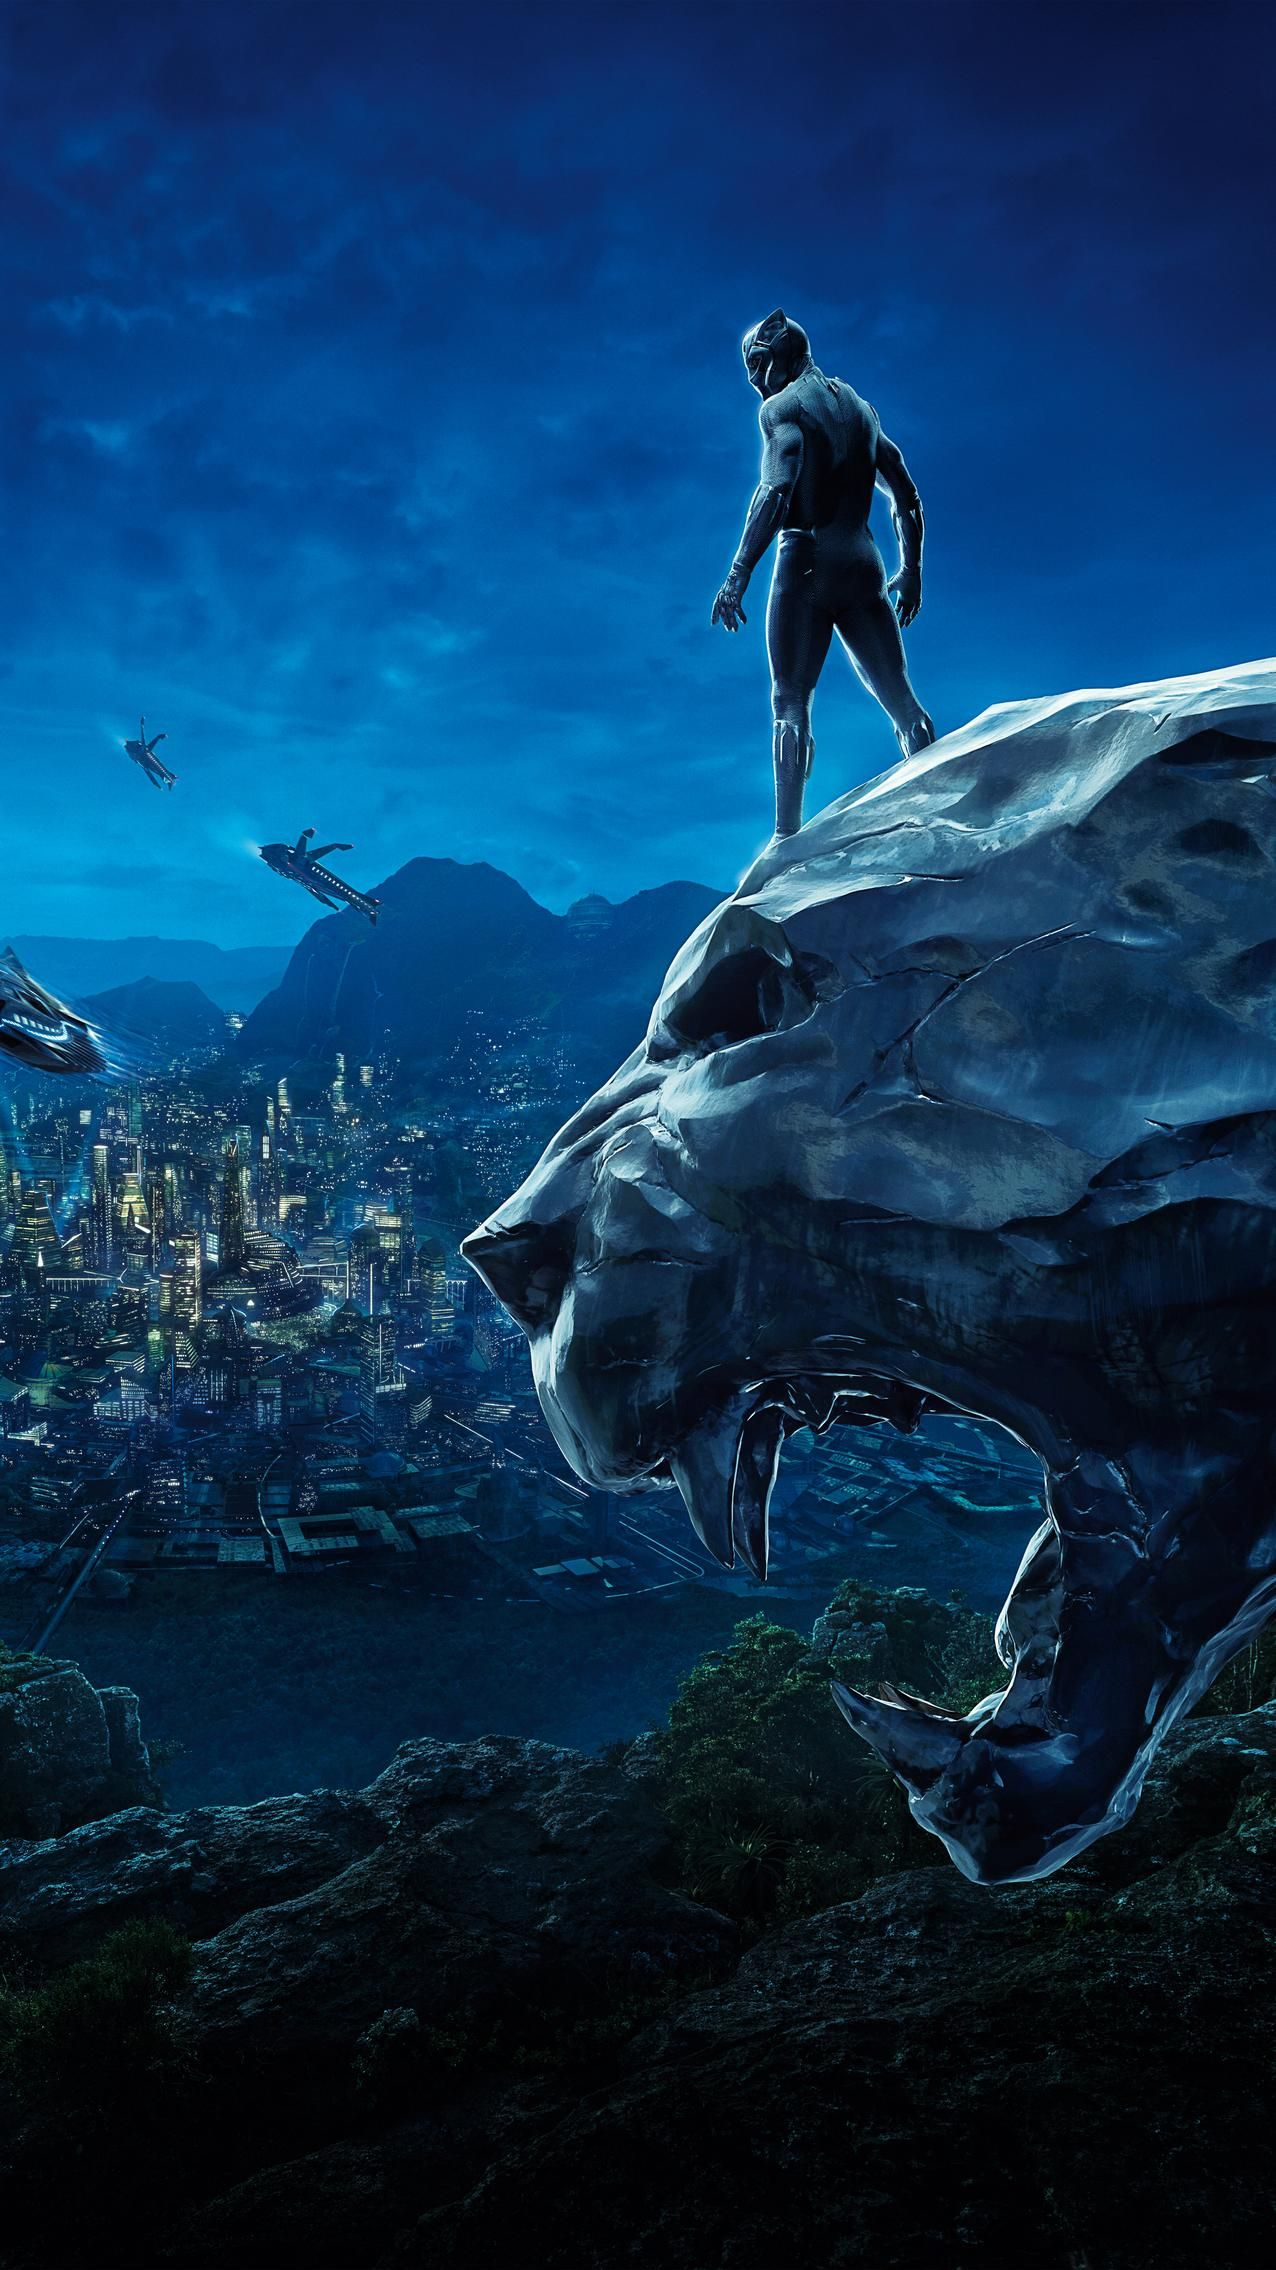 Black Panther (2018) Phone Wallpaper   Moviemania